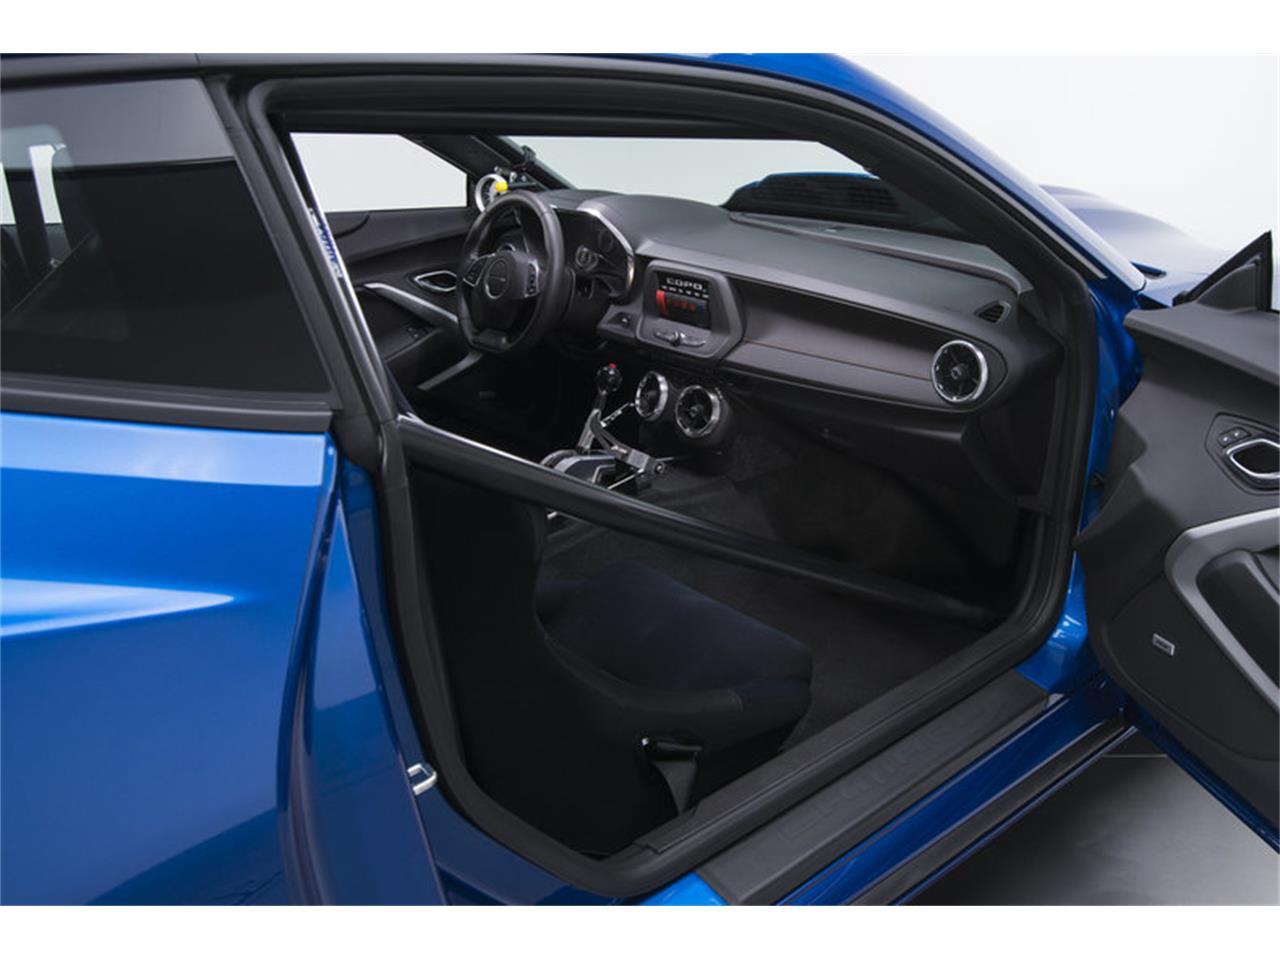 Large Picture of 2016 Chevrolet Camaro COPO located in North Carolina - $139,900.00 - MFAR